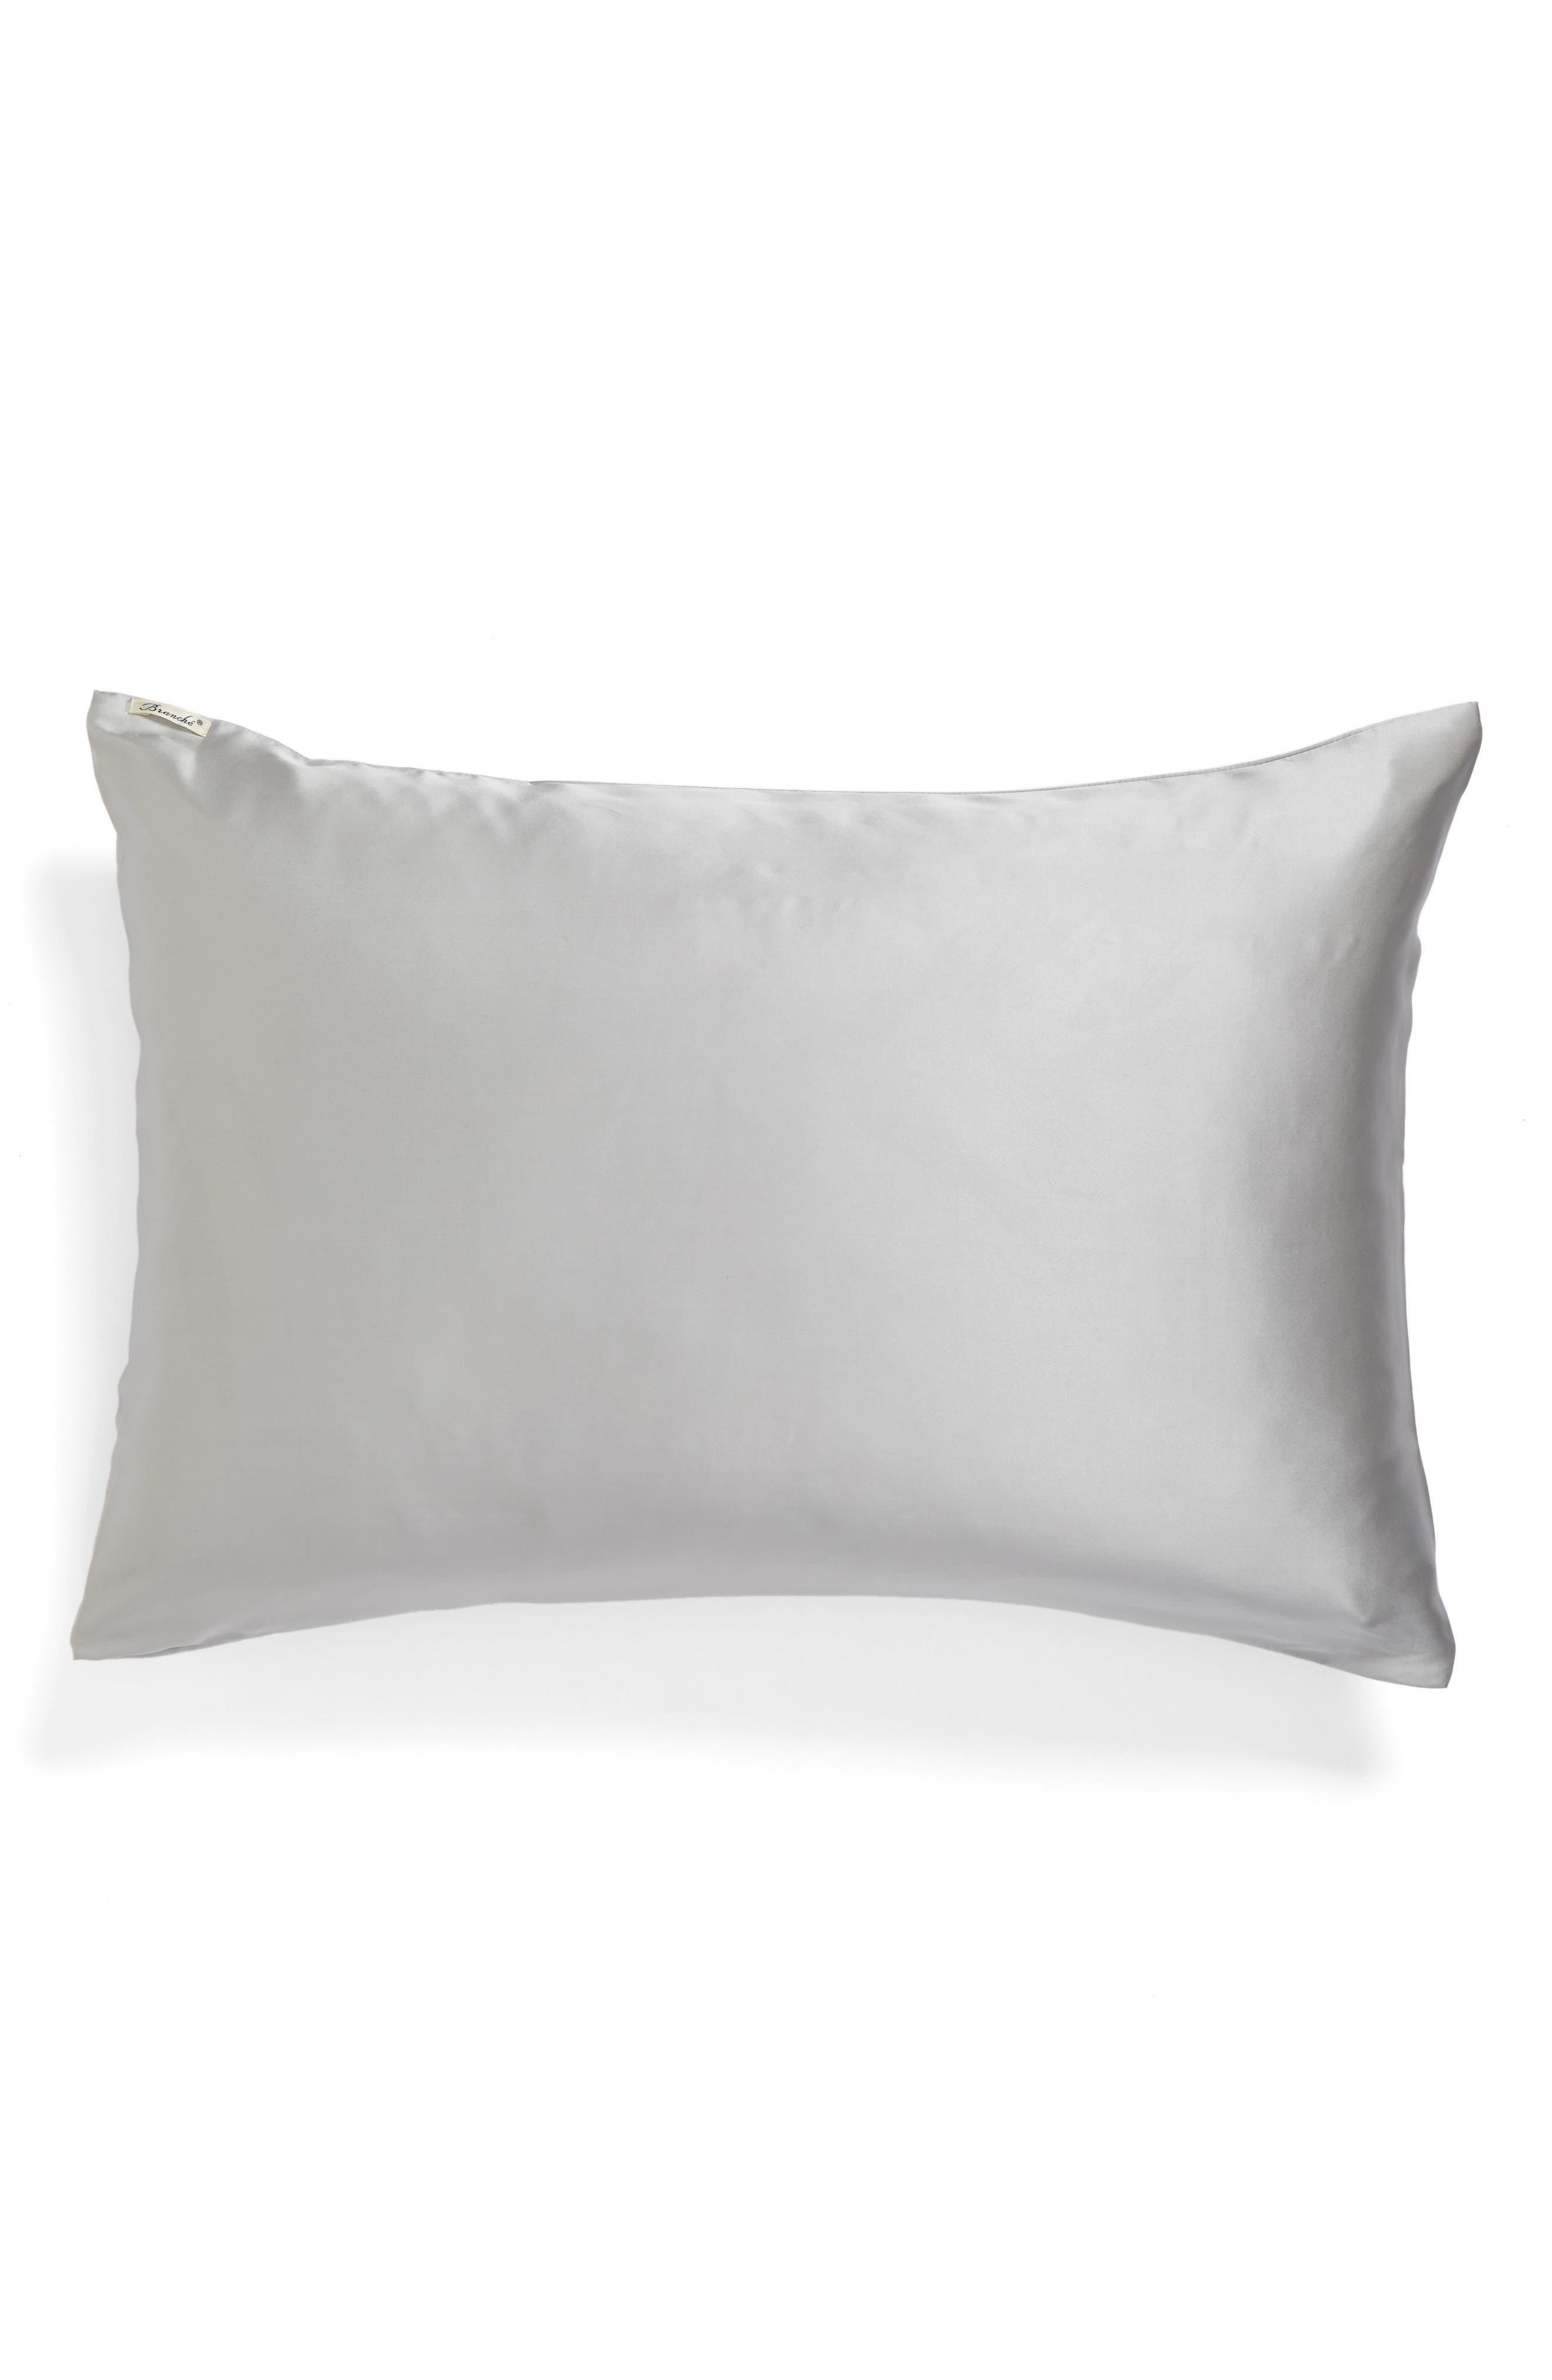 Branché Beauty Silk Charmeuse Pillowcase,                             Main thumbnail 1, color,                             040